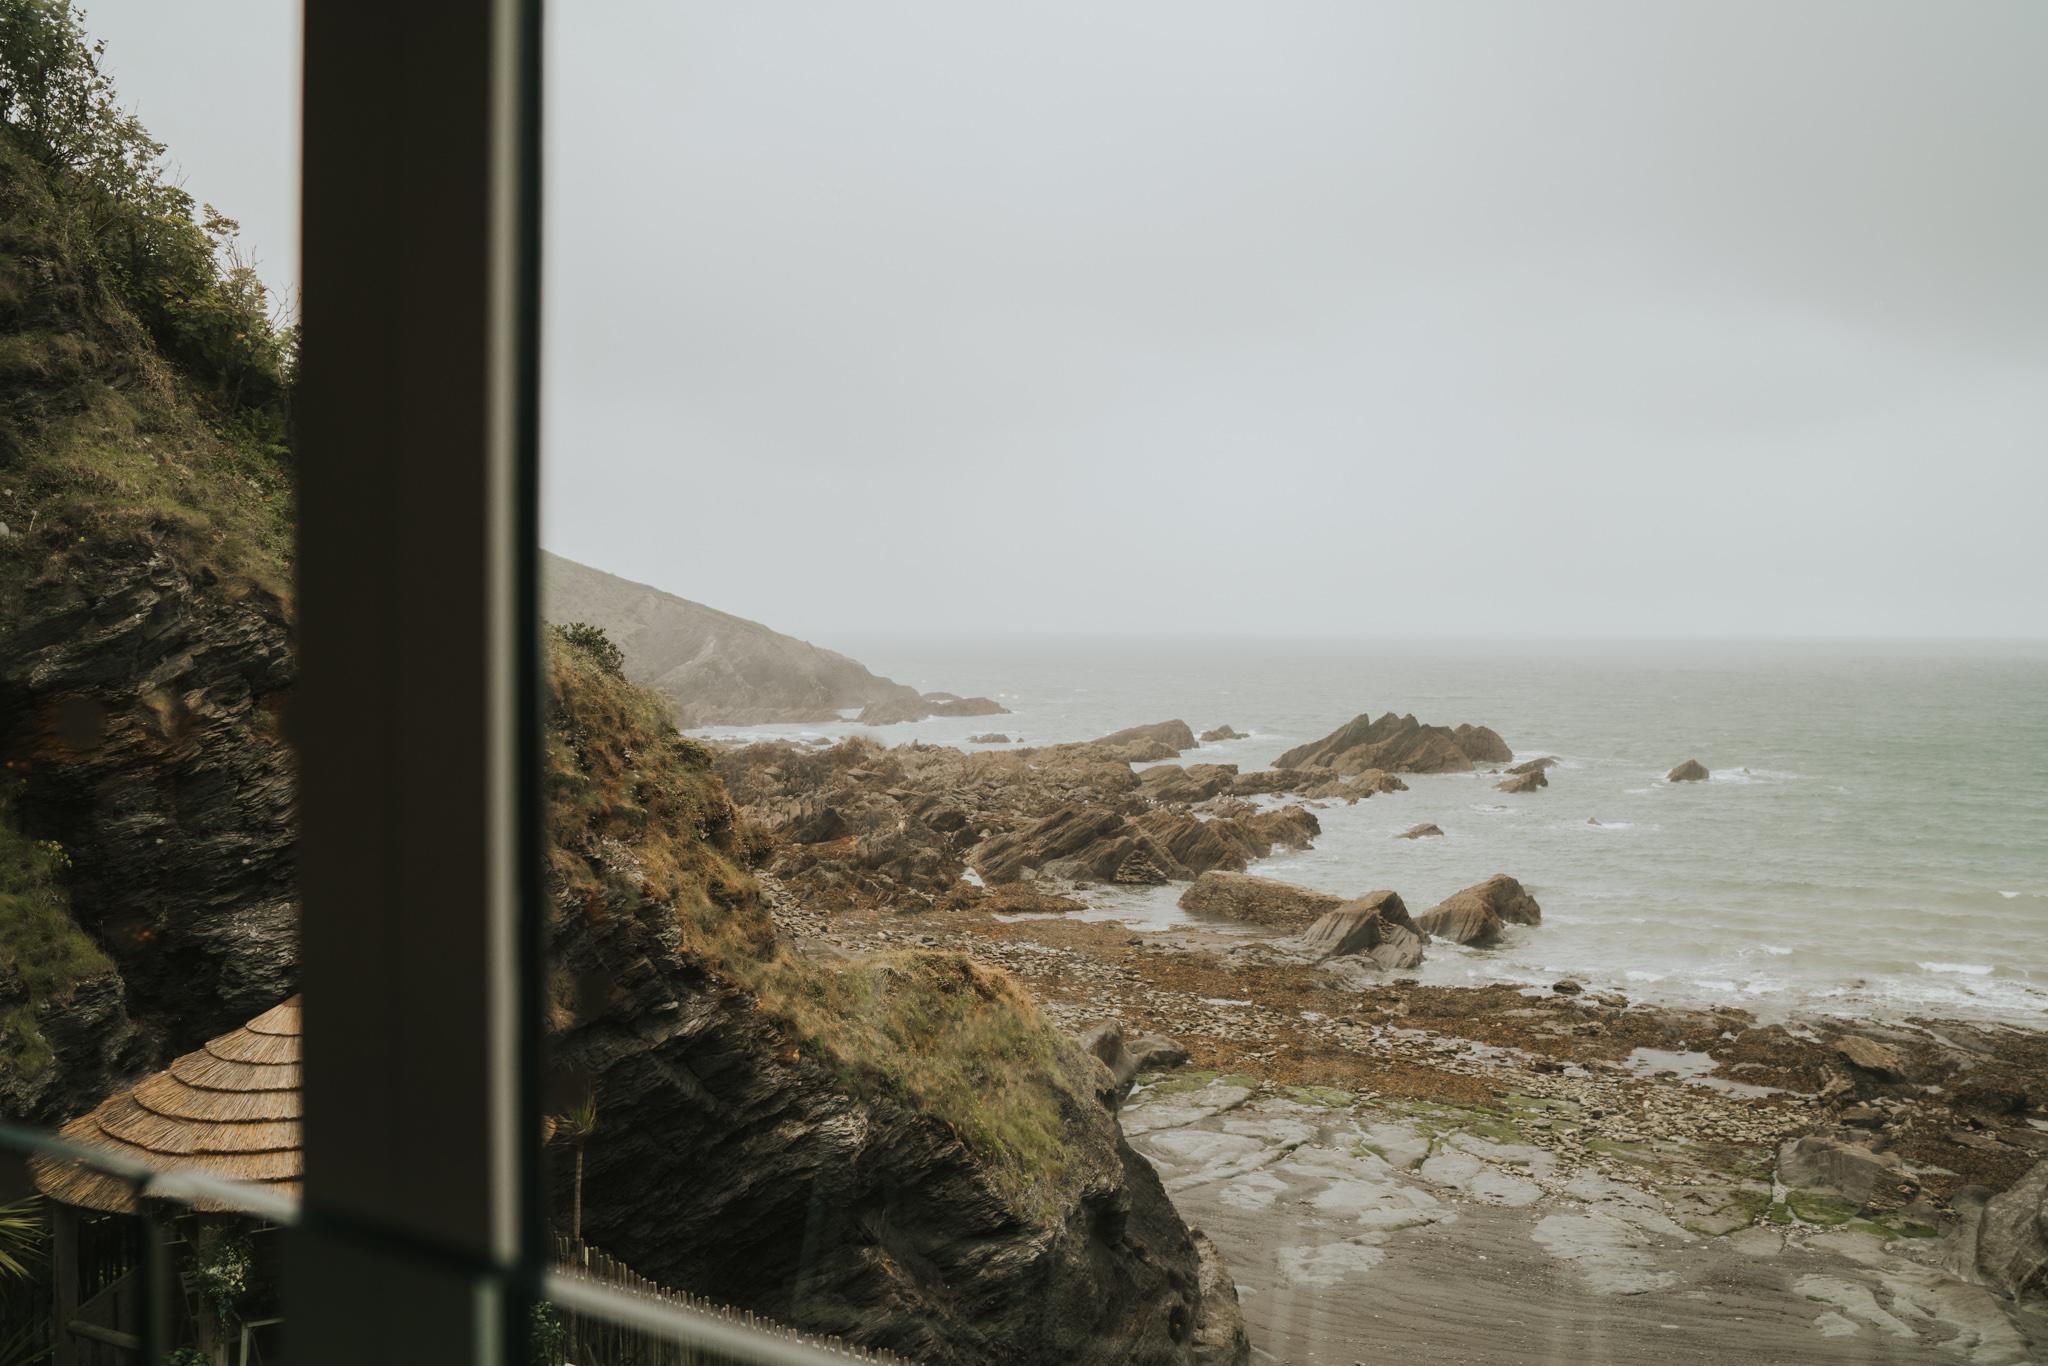 john-amy-relaxed-beach-wedding-tunnels-beaches-ilfracombe-north-devon-grace-elizabeth-colchester-essex-alternative-relaxed-wedding-photography-devon-suffolk-norfolk-essex (18 of 159).jpg